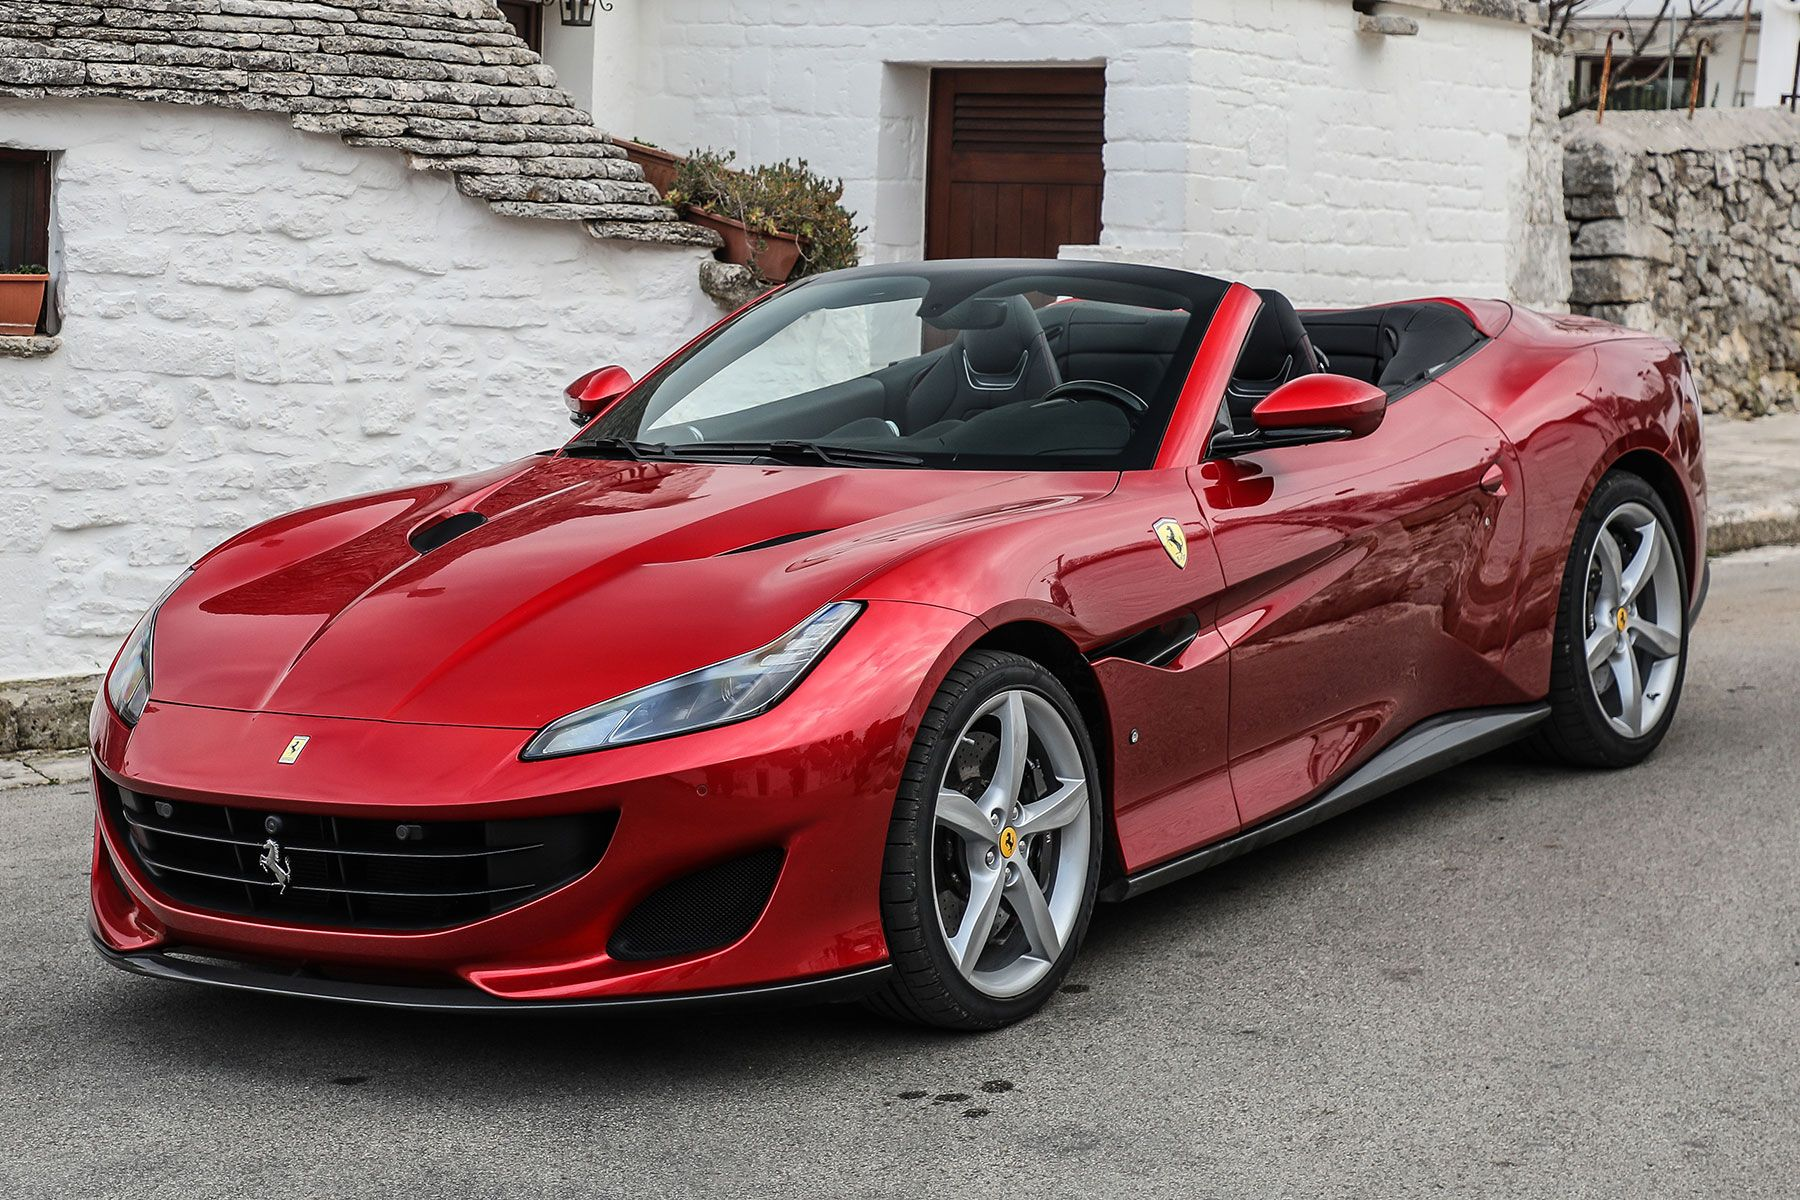 2018 Ferrari Portofino Coches ferrari, Autos ferrari